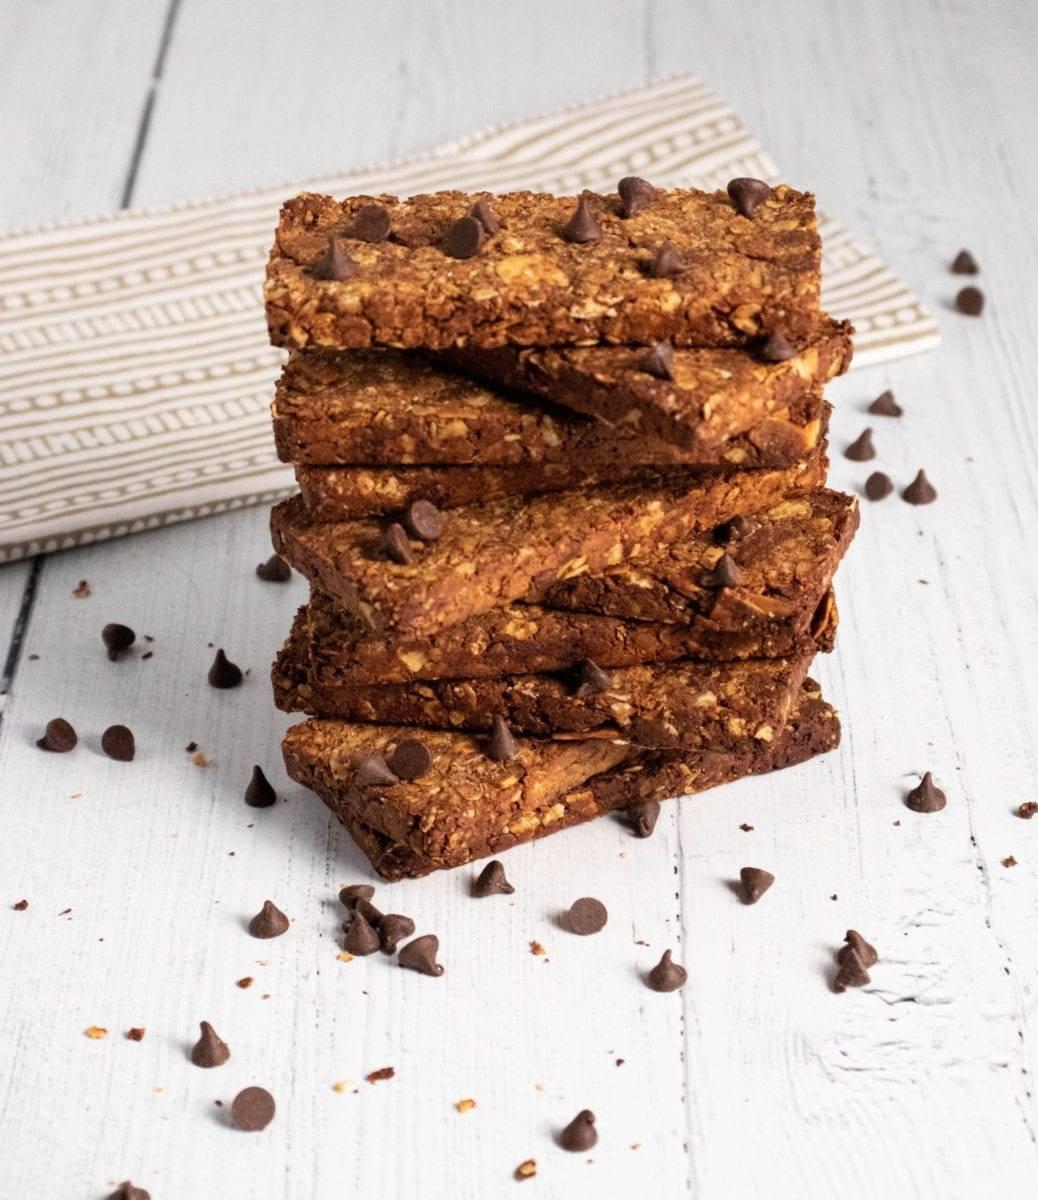 Chocolate Granola Almond Bars Meal prep Counting Macros